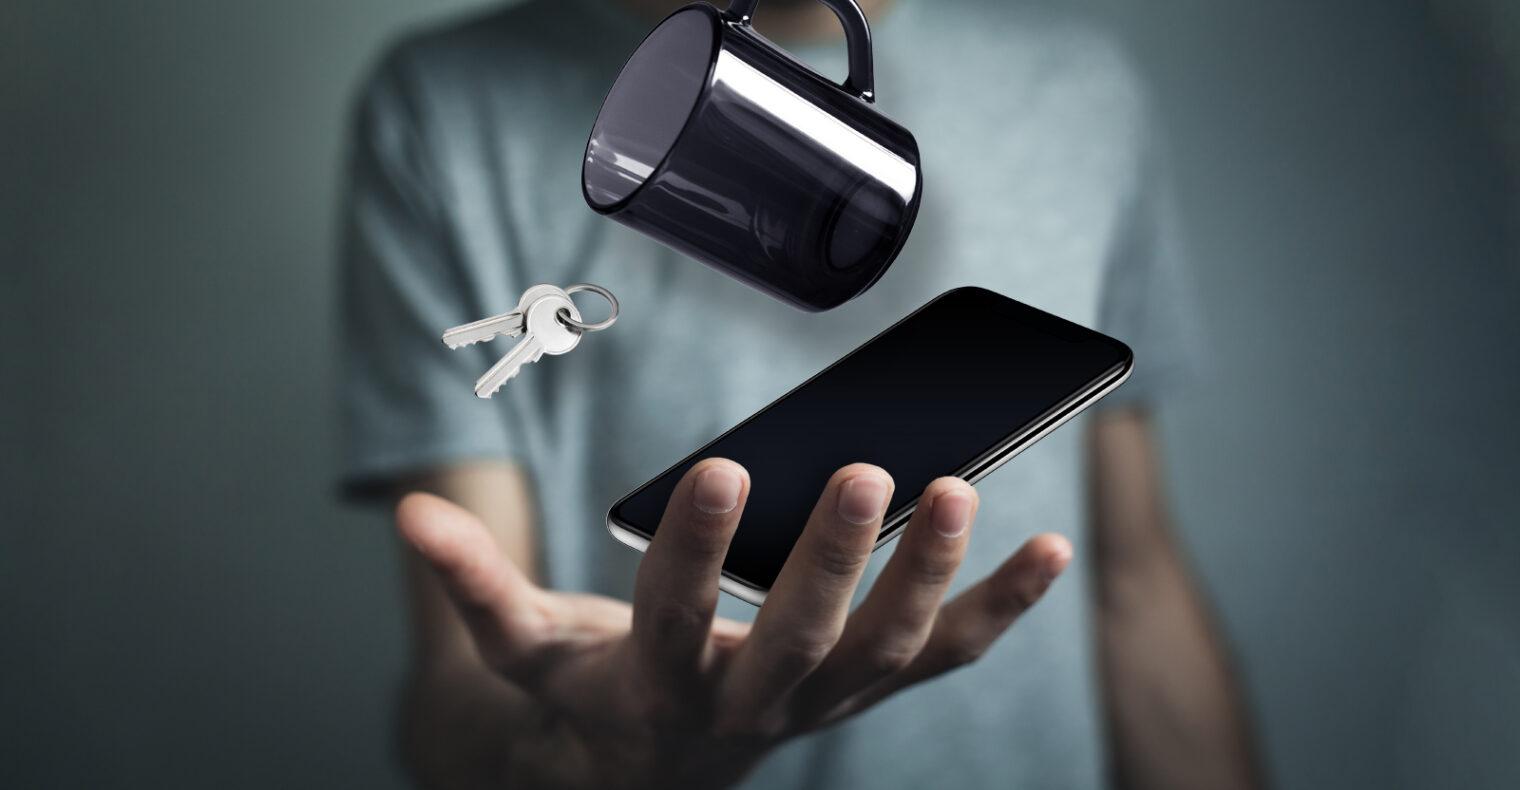 keys, mug and phone falling into a hand